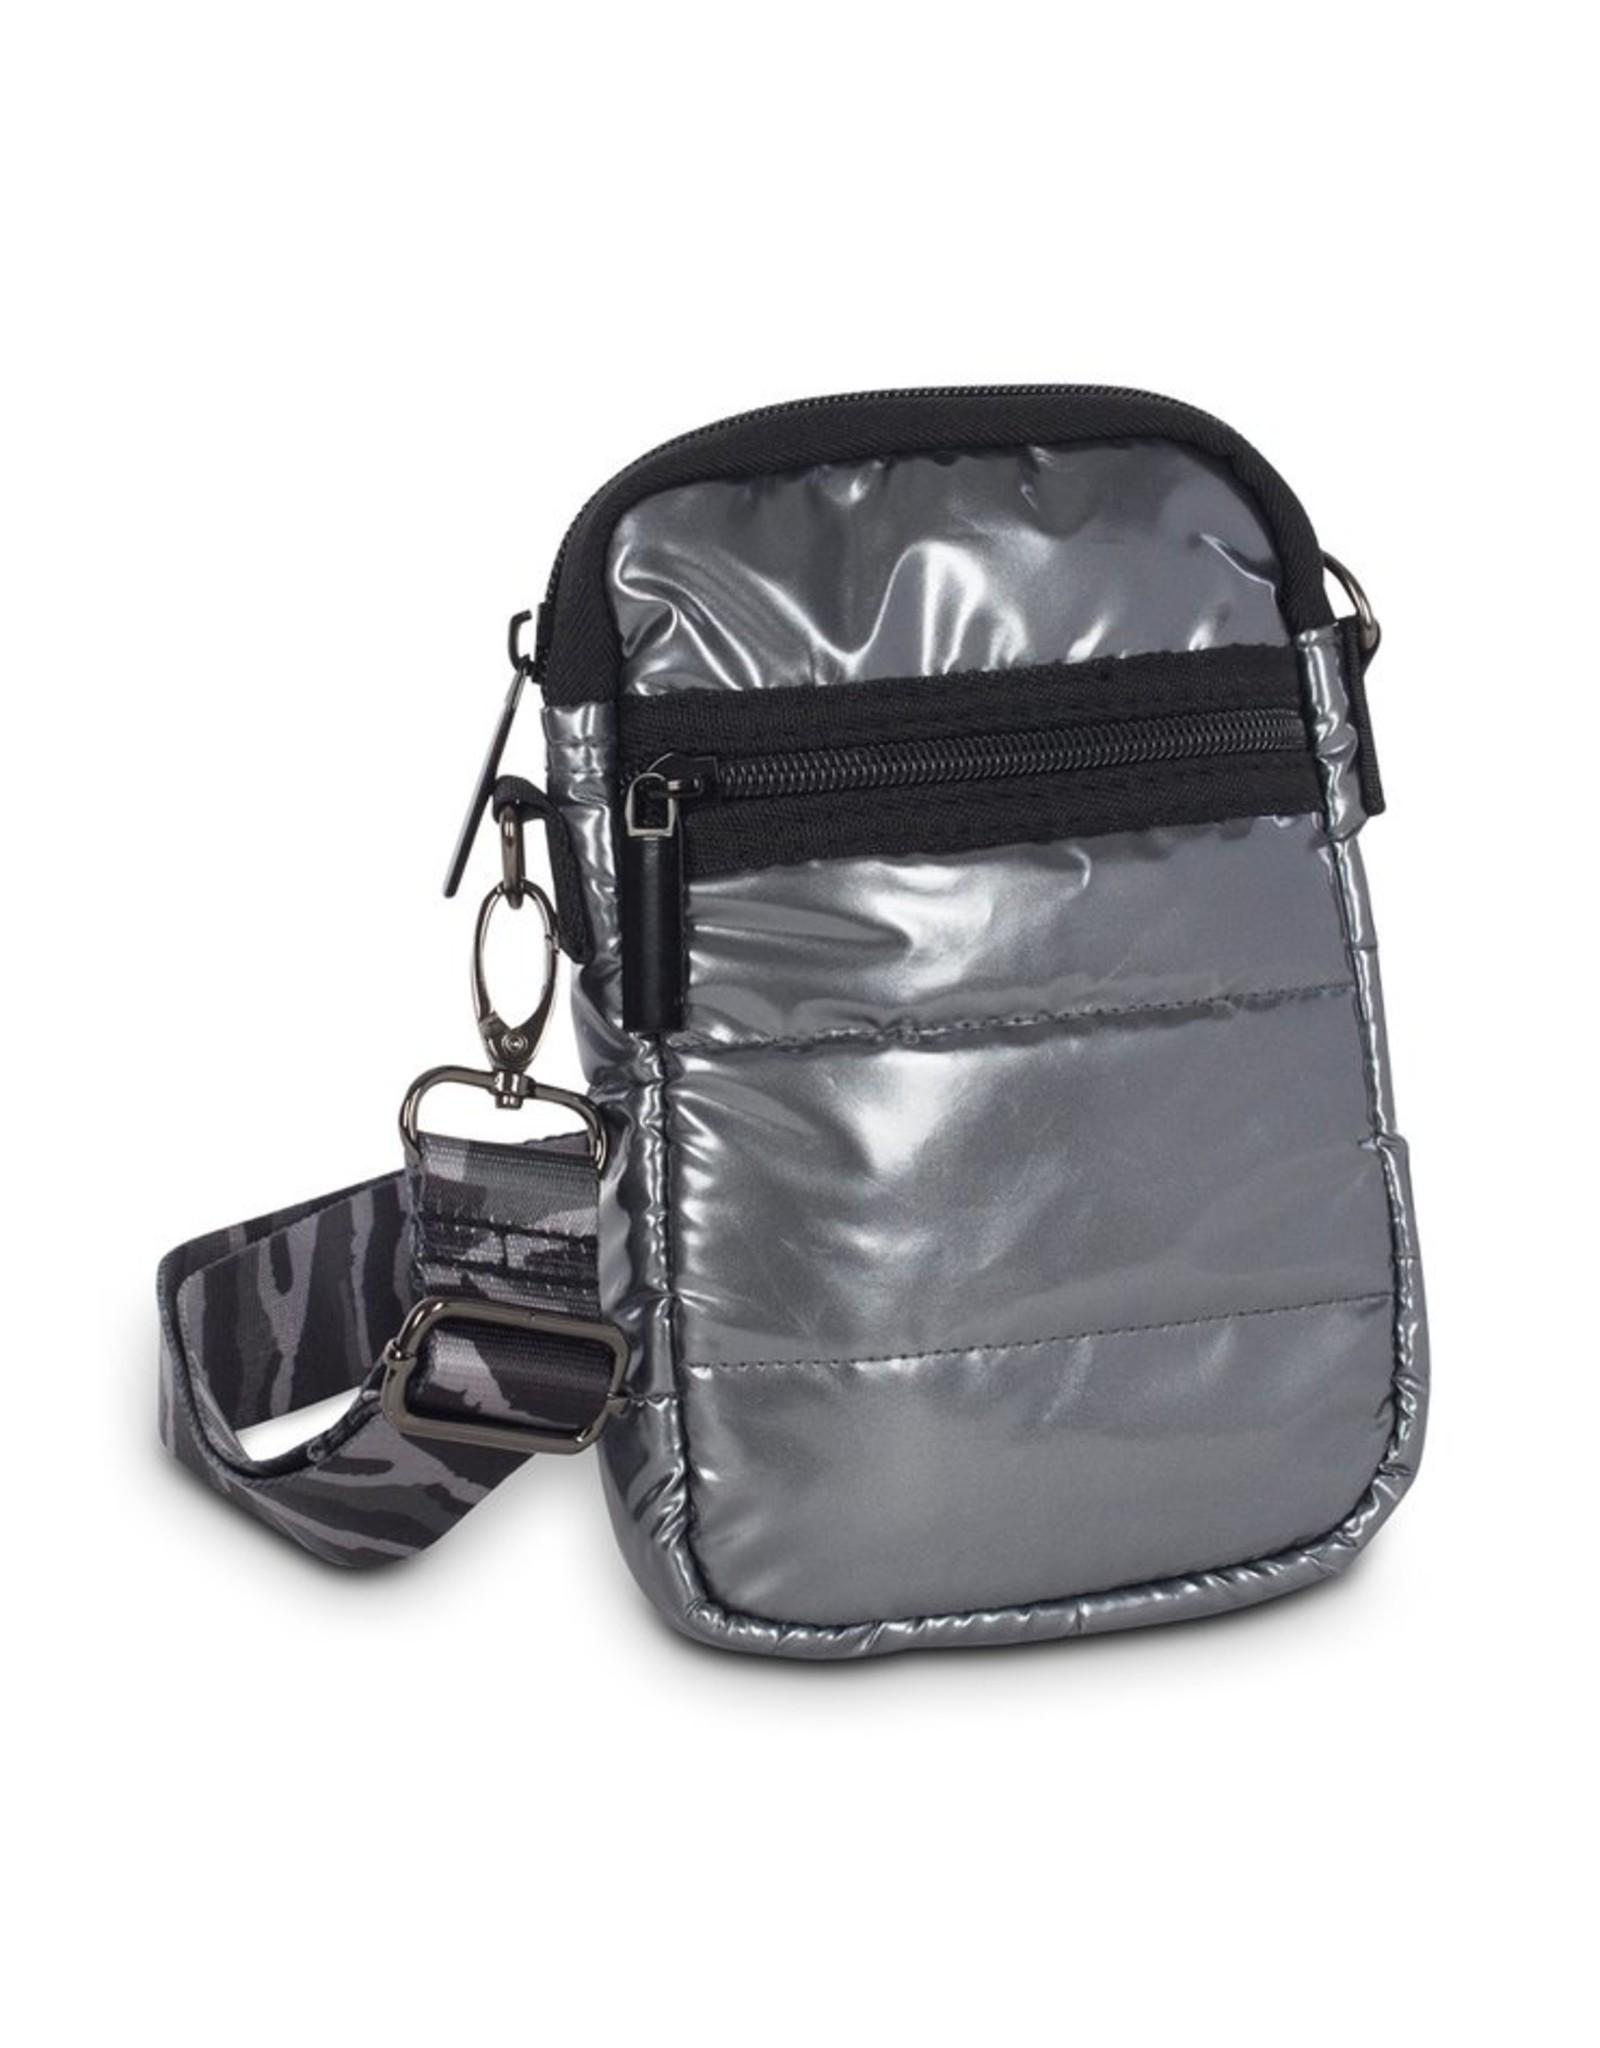 haute shore Cell phone bag casey cool